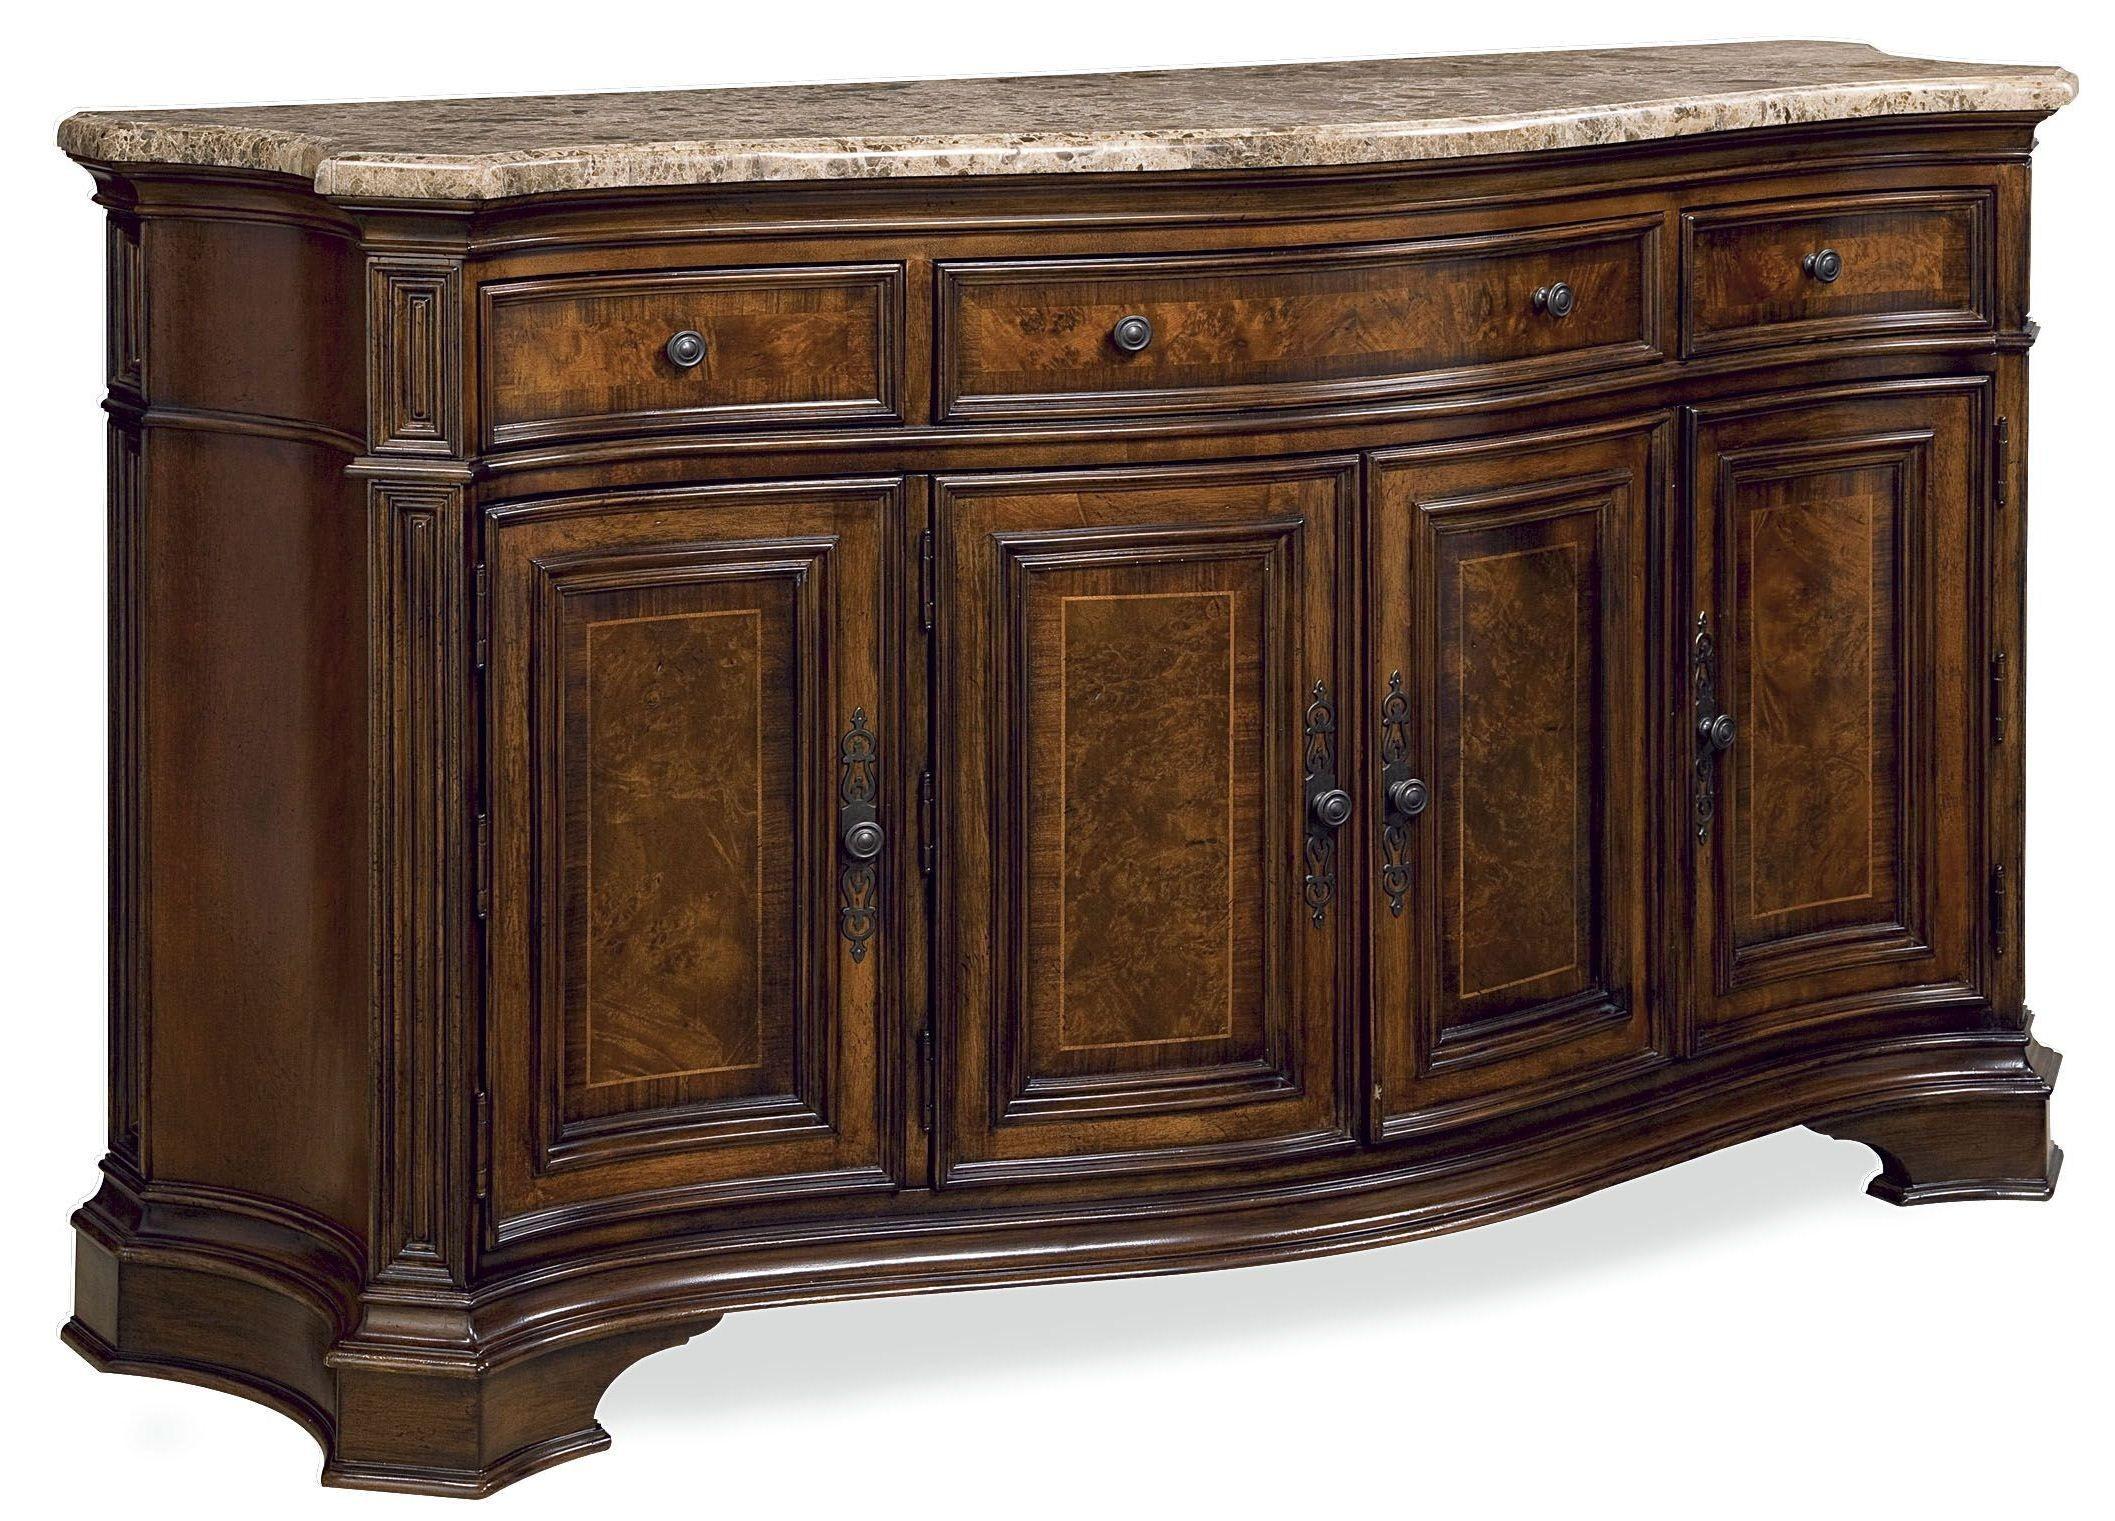 Villa Cortina Bedroom Furniture: Villa Cortina Marble Top Storage Credenza From Universal